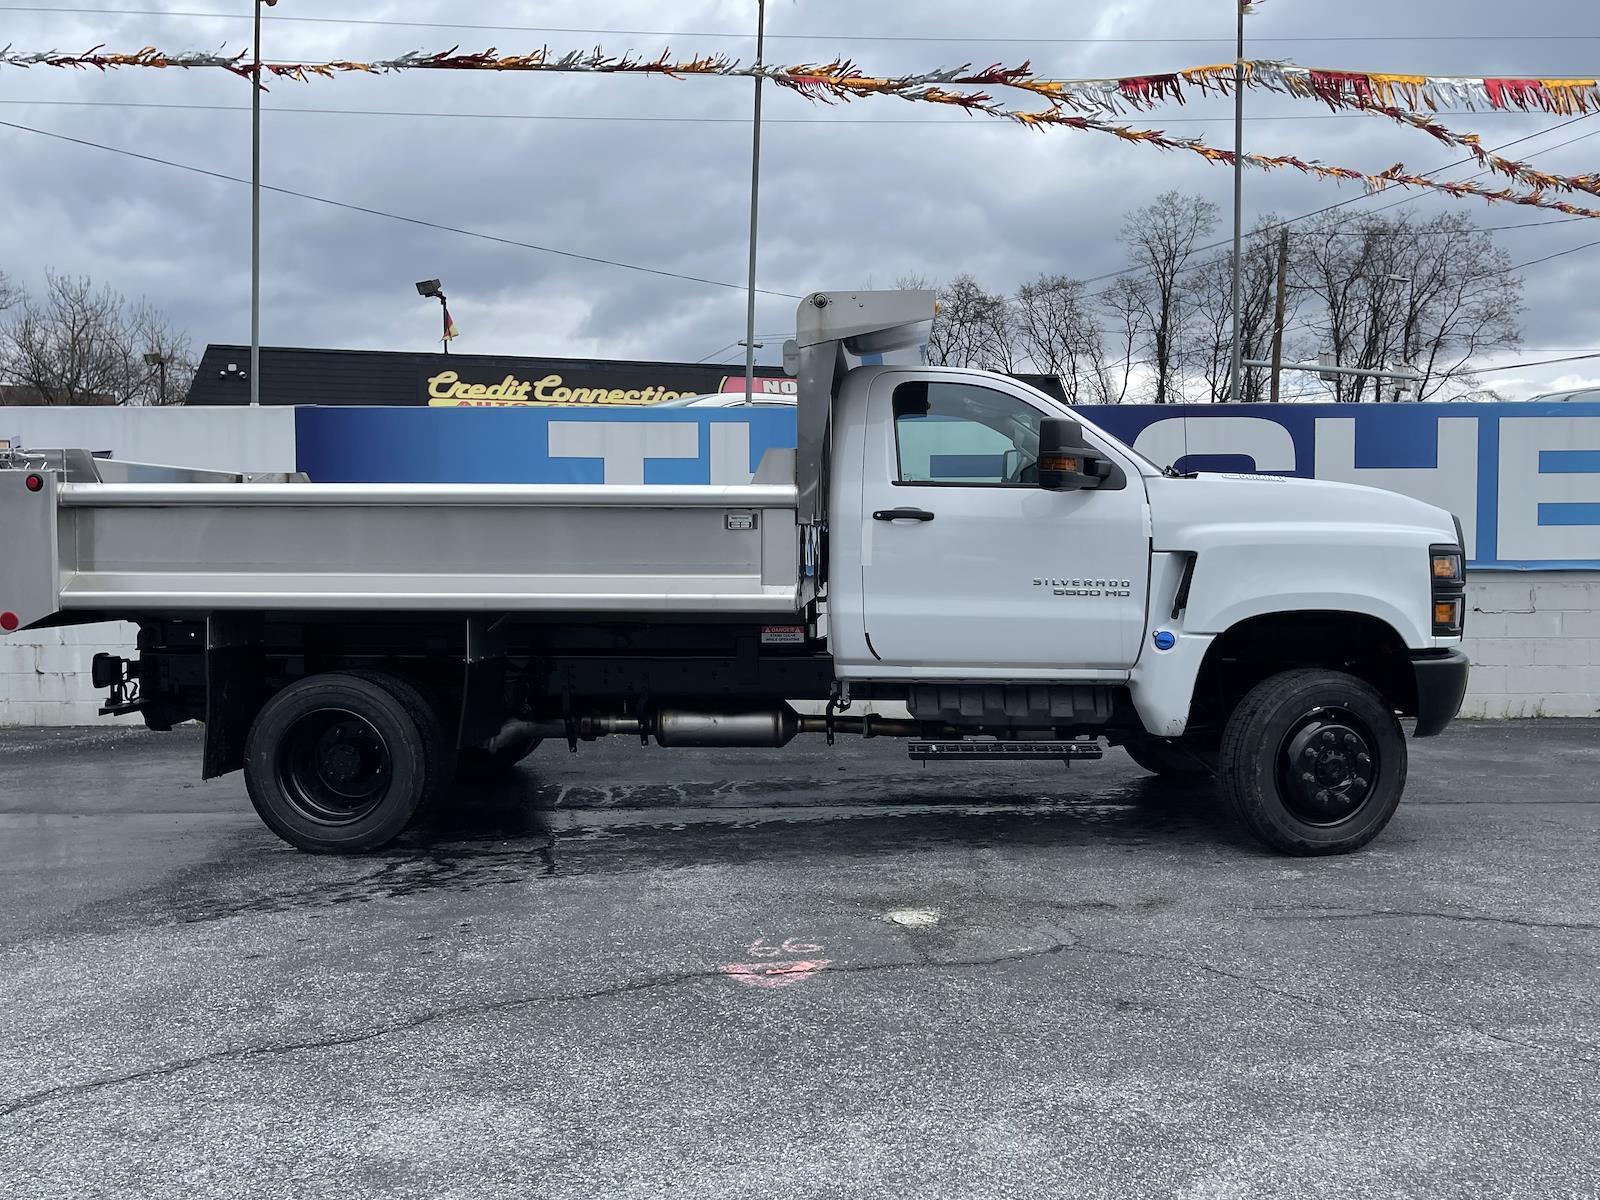 2020 Chevrolet Silverado 4500 Regular Cab DRW 4x4, Galion Dump Body #205977 - photo 5